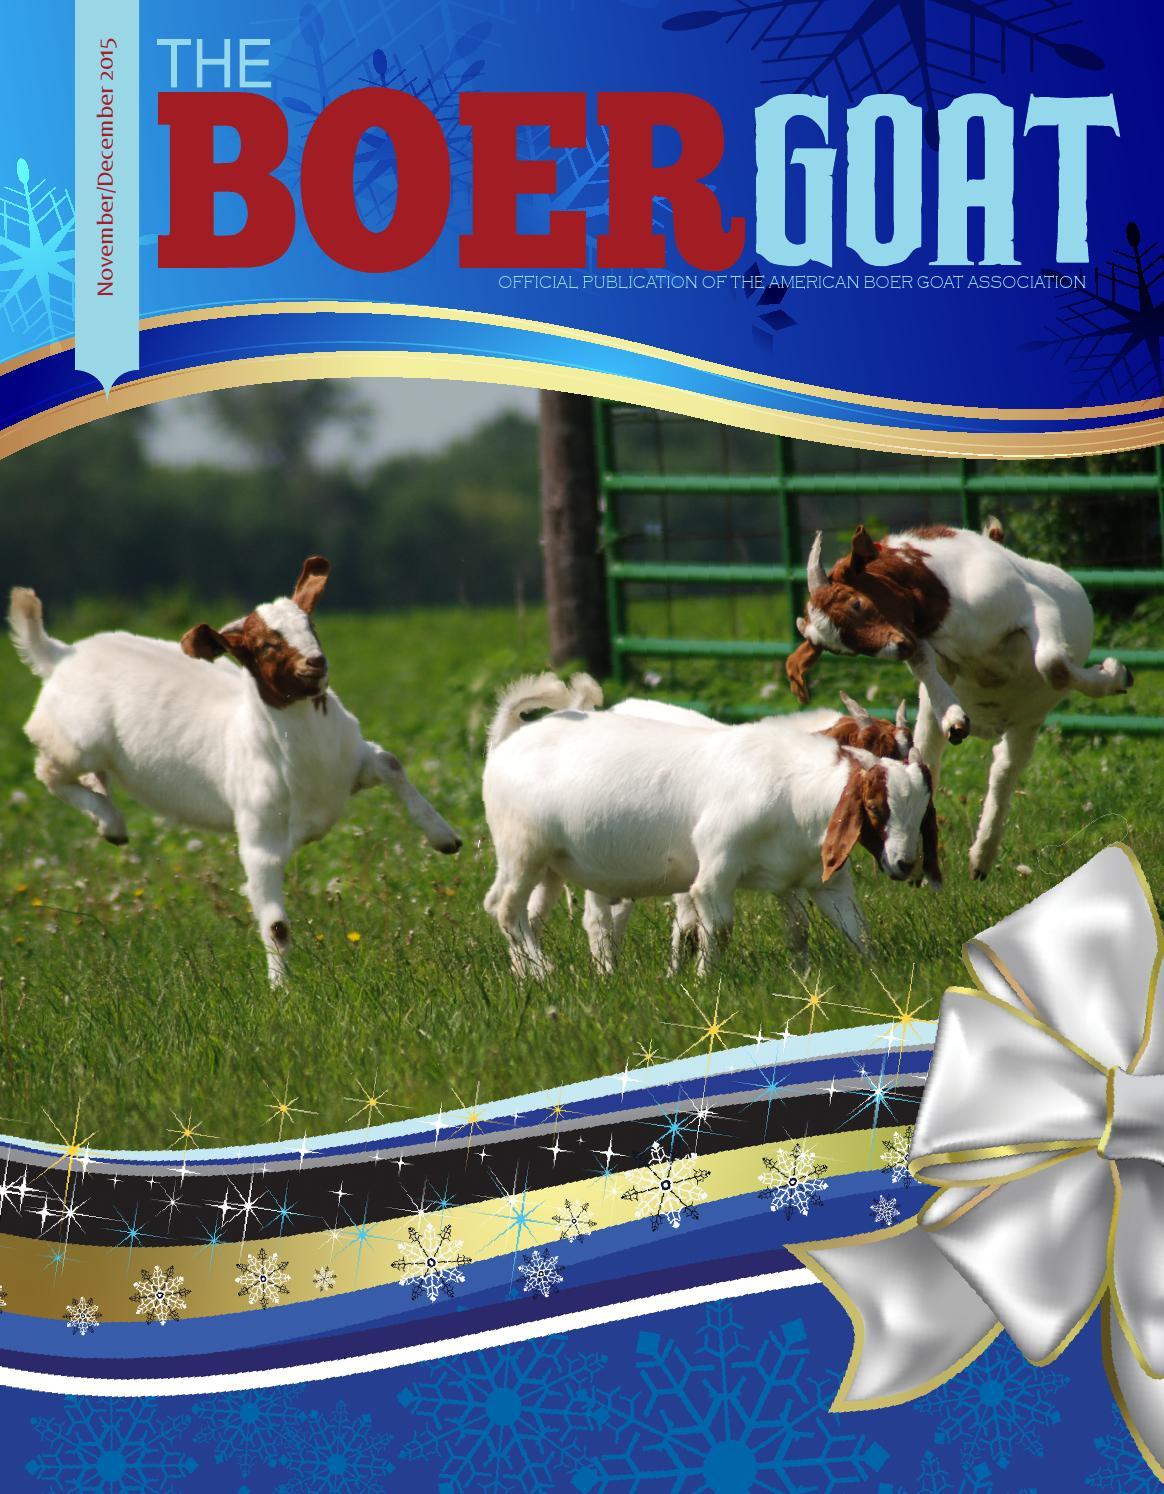 NovDec2015 by American Boer Goat Association - photo#10